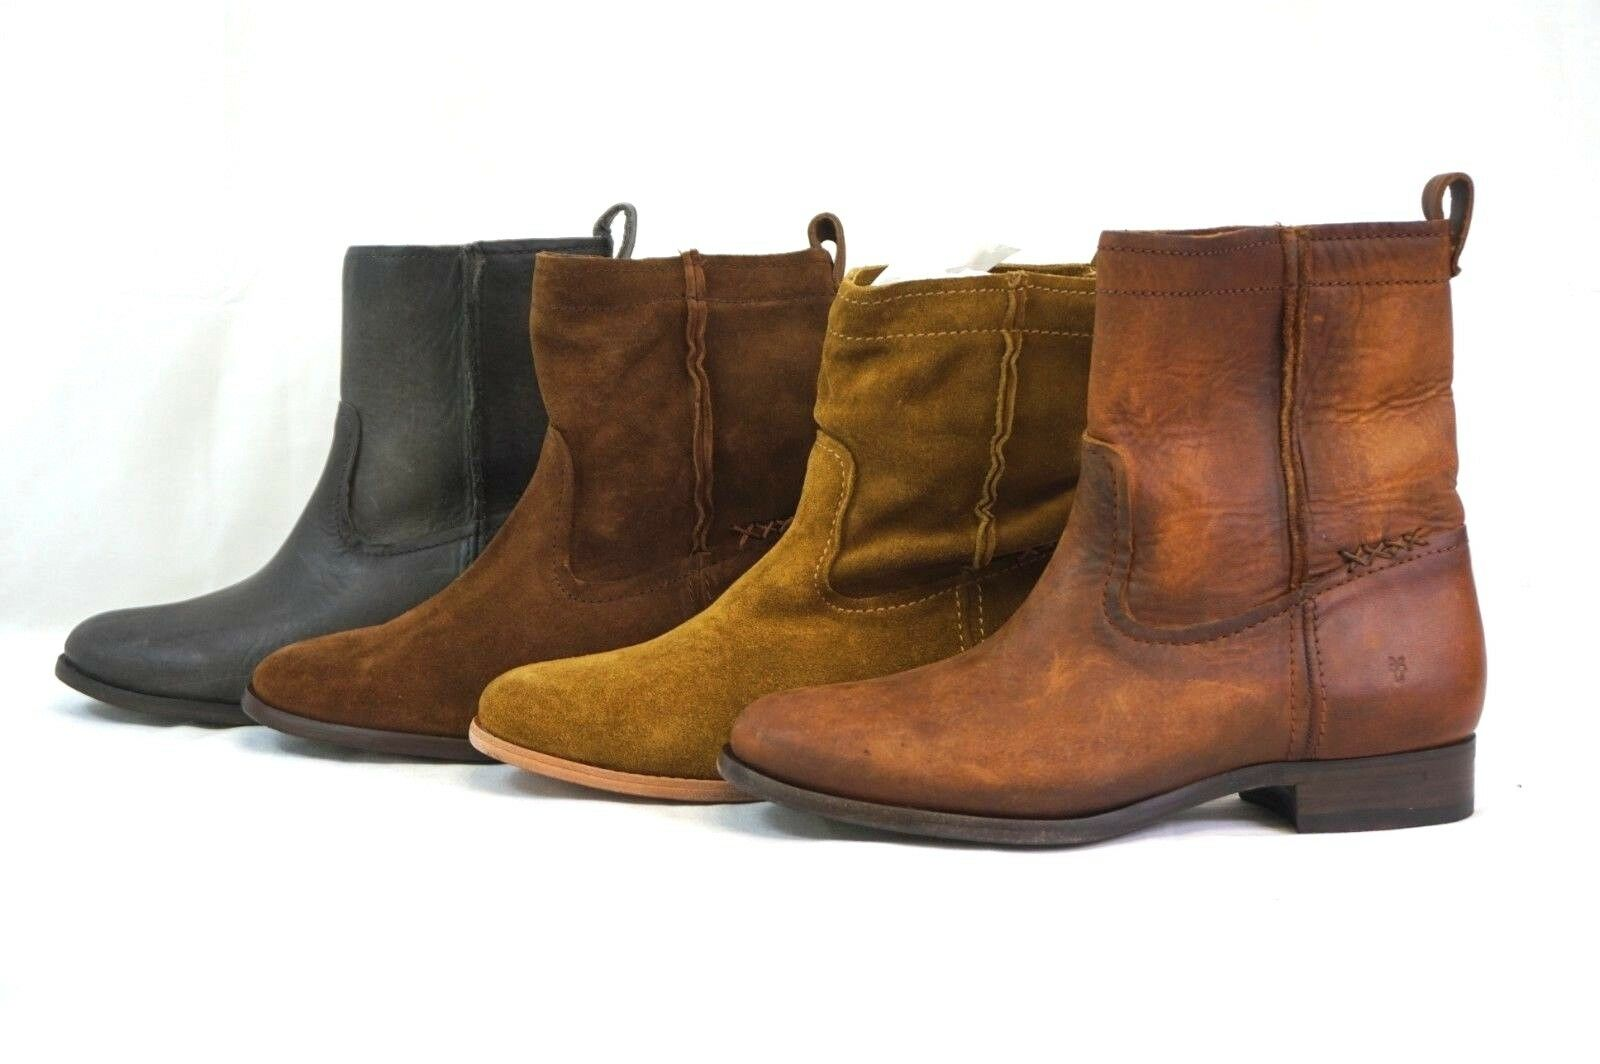 NEW  FRYE FRYE FRYE damen' s Cara Short Pull-On Leather Suede Stiefel 5.5, 6, 6.5, 7, 8, 8.5 2e55a8